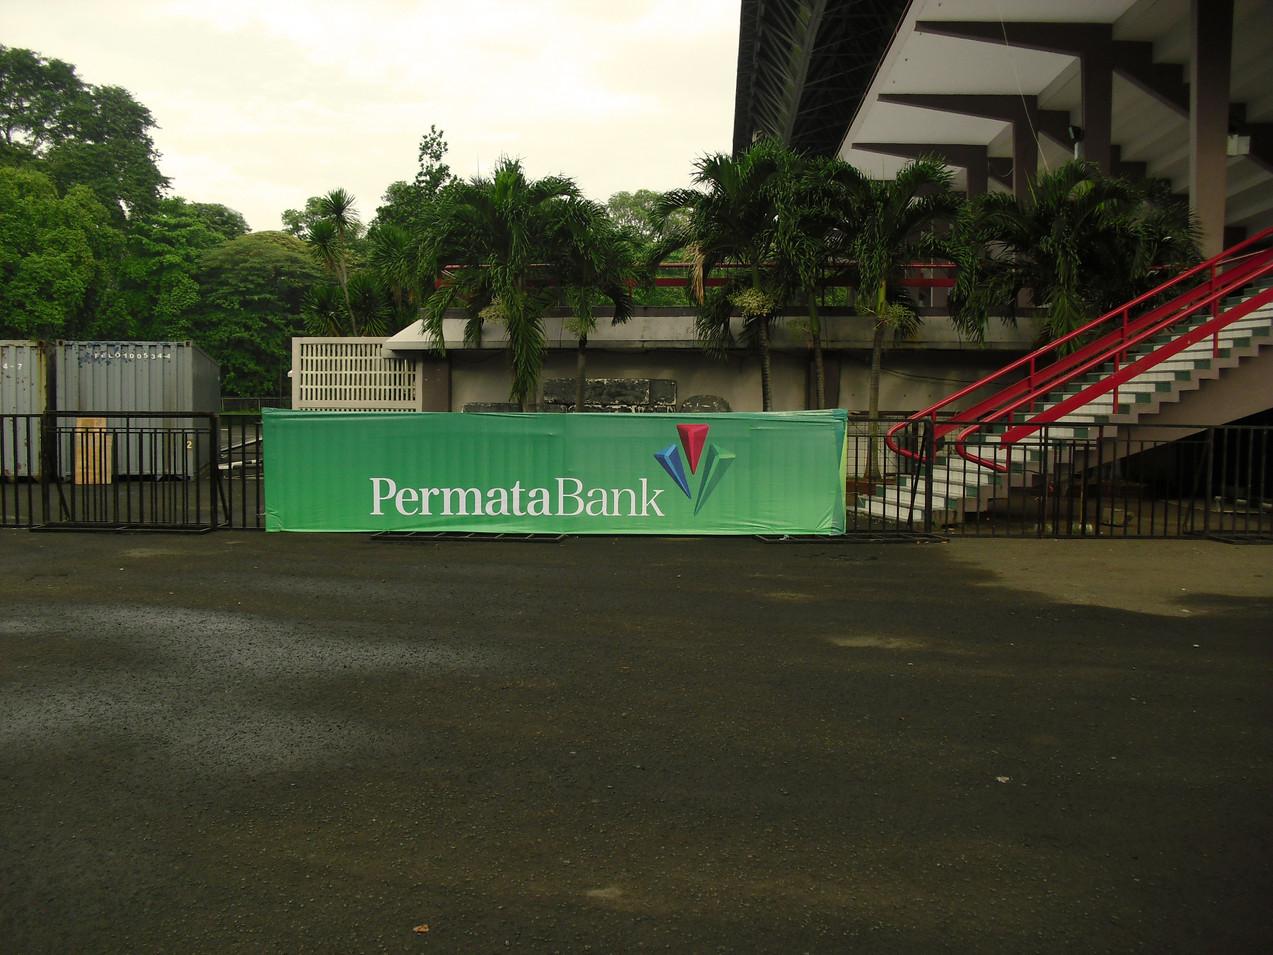 Gate Banner - Permata Bank by Quickprint